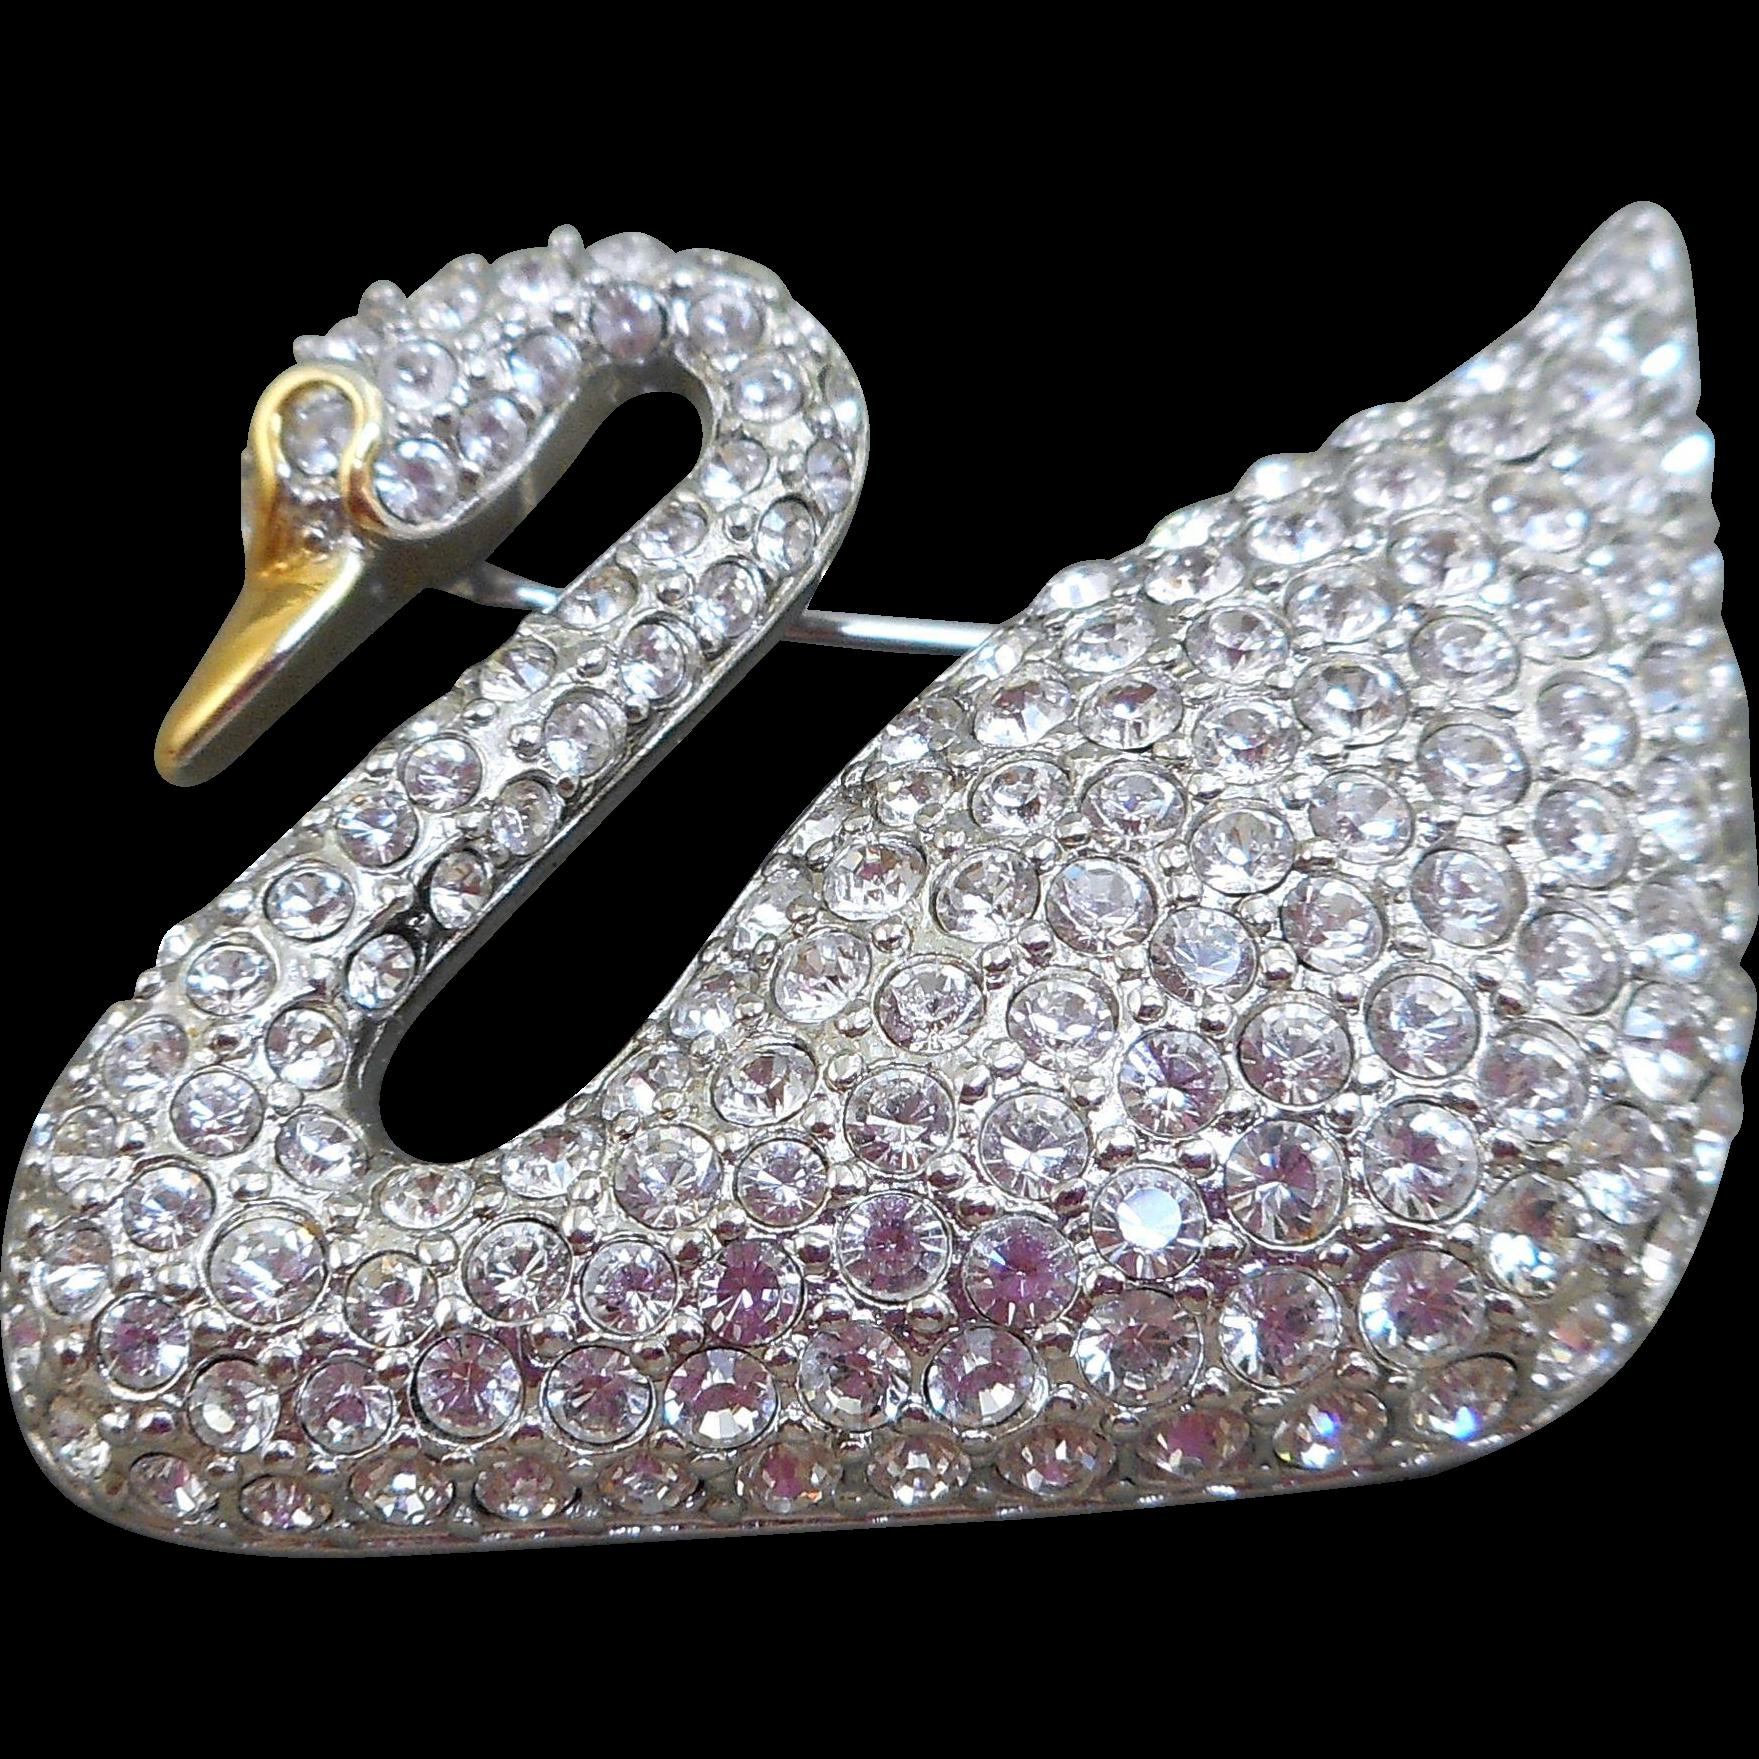 Swarovski swan brooch from antiqueali on ruby lane for Swarovski jewelry online store